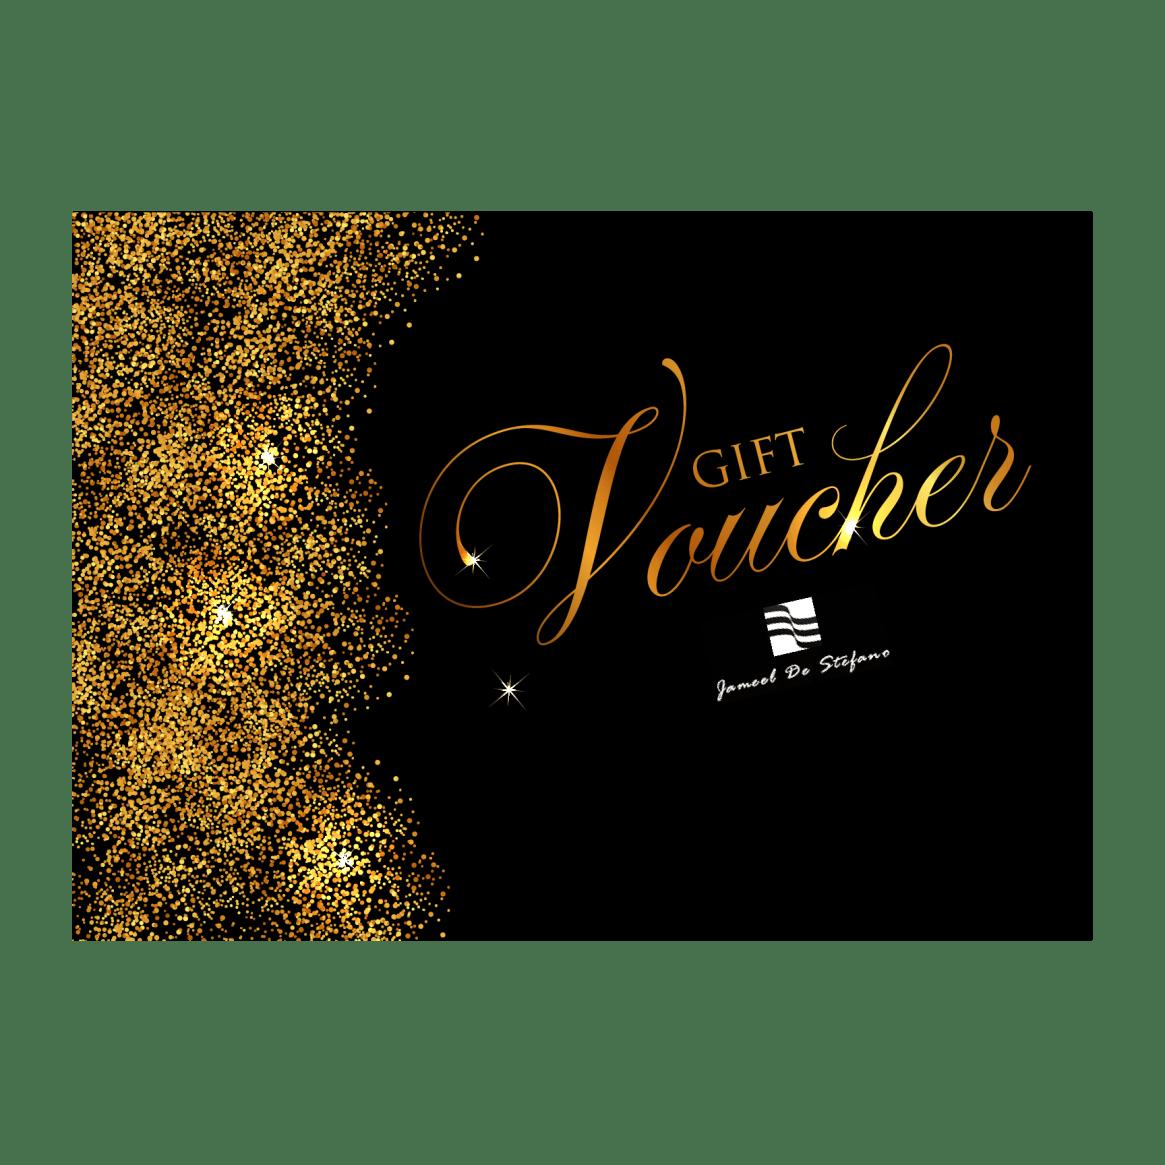 Jameel De Stefano hair Salon And Spa Gift Voucher